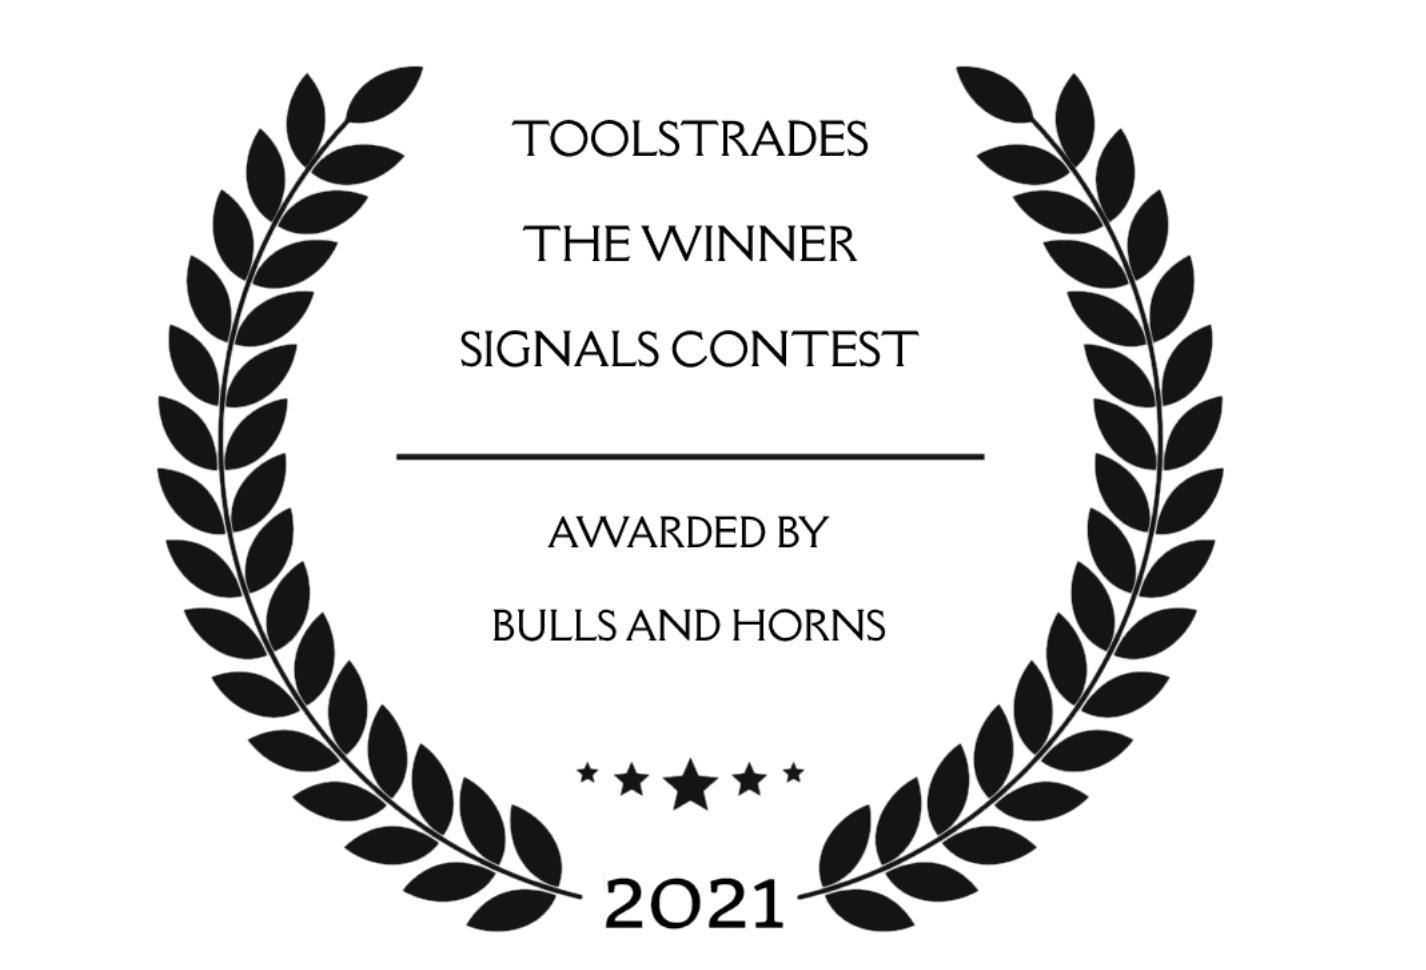 award04 Awards - ToolsTrades